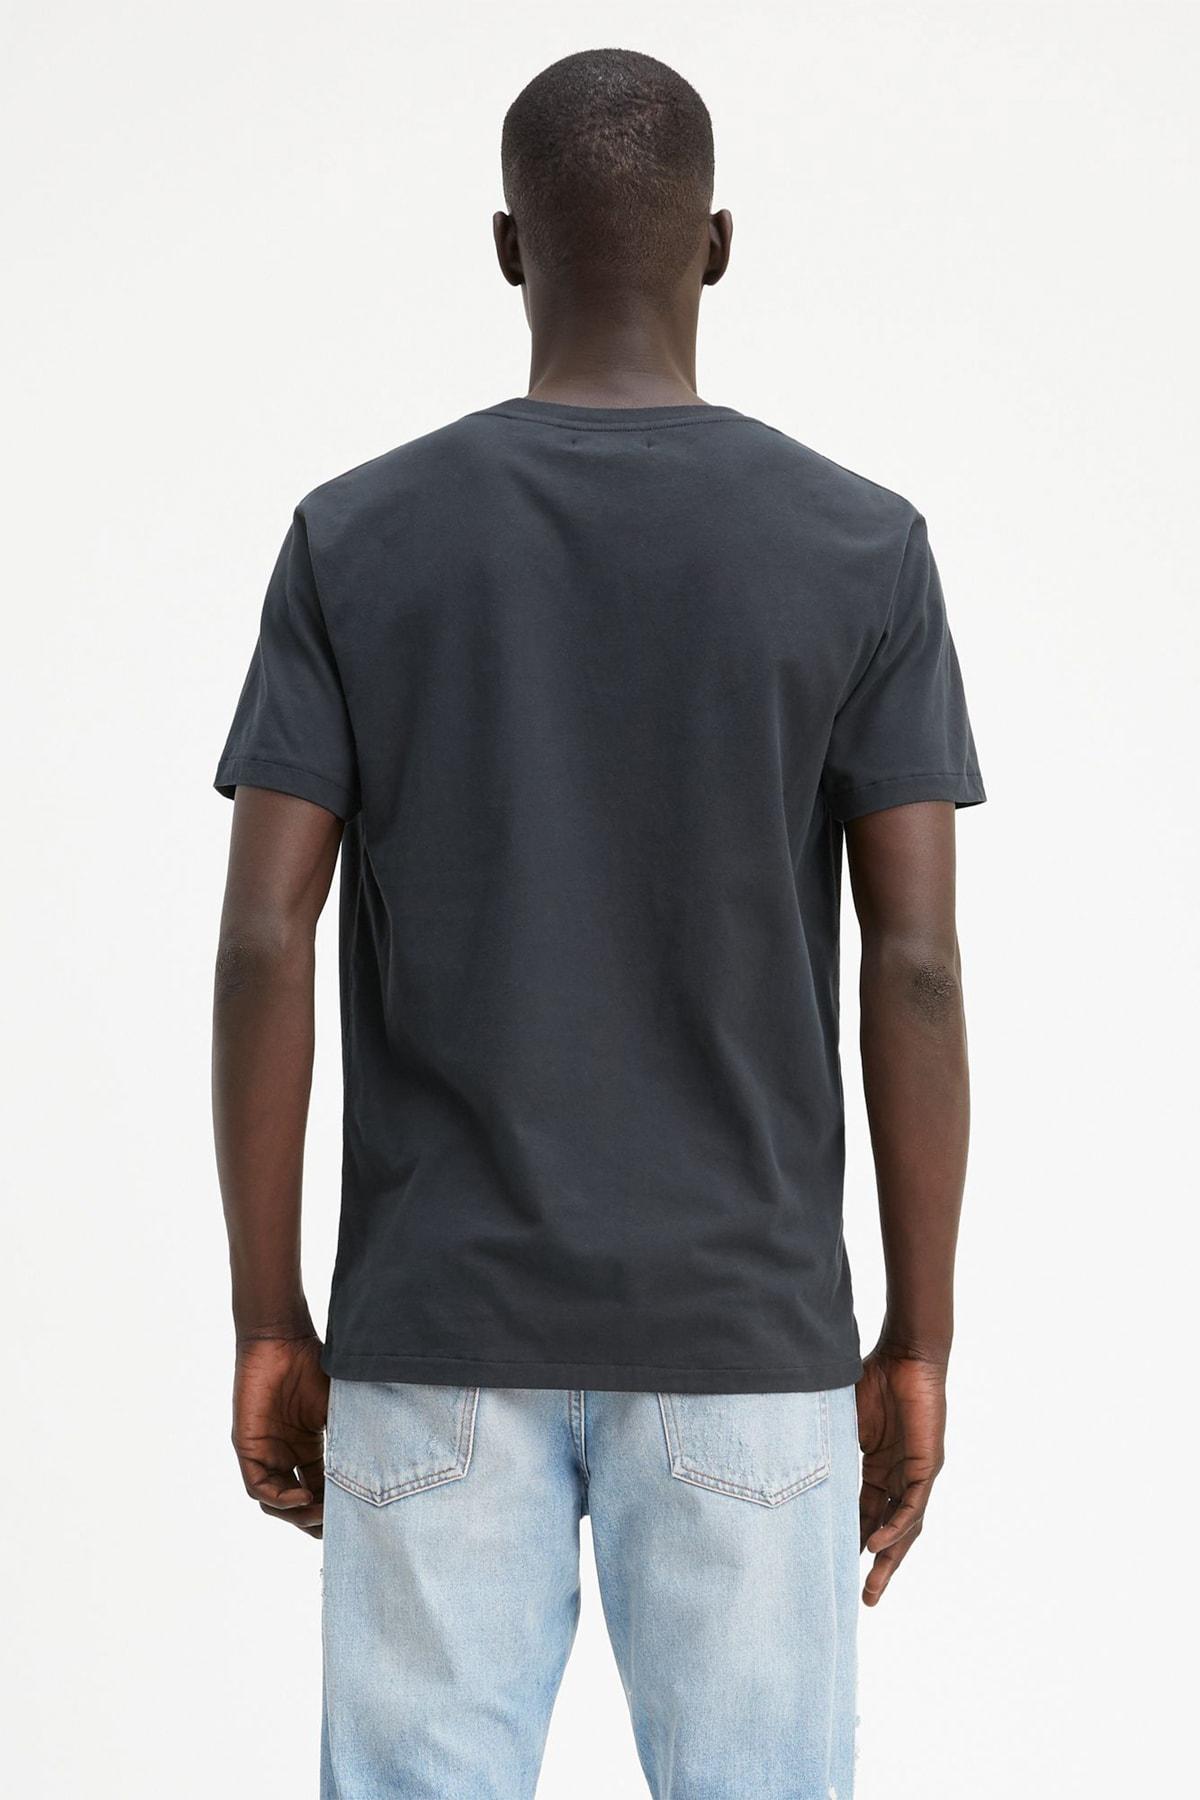 Levi's Lmc Pocket Tee Lmc Caviar Black Siyah Erkek Tişört